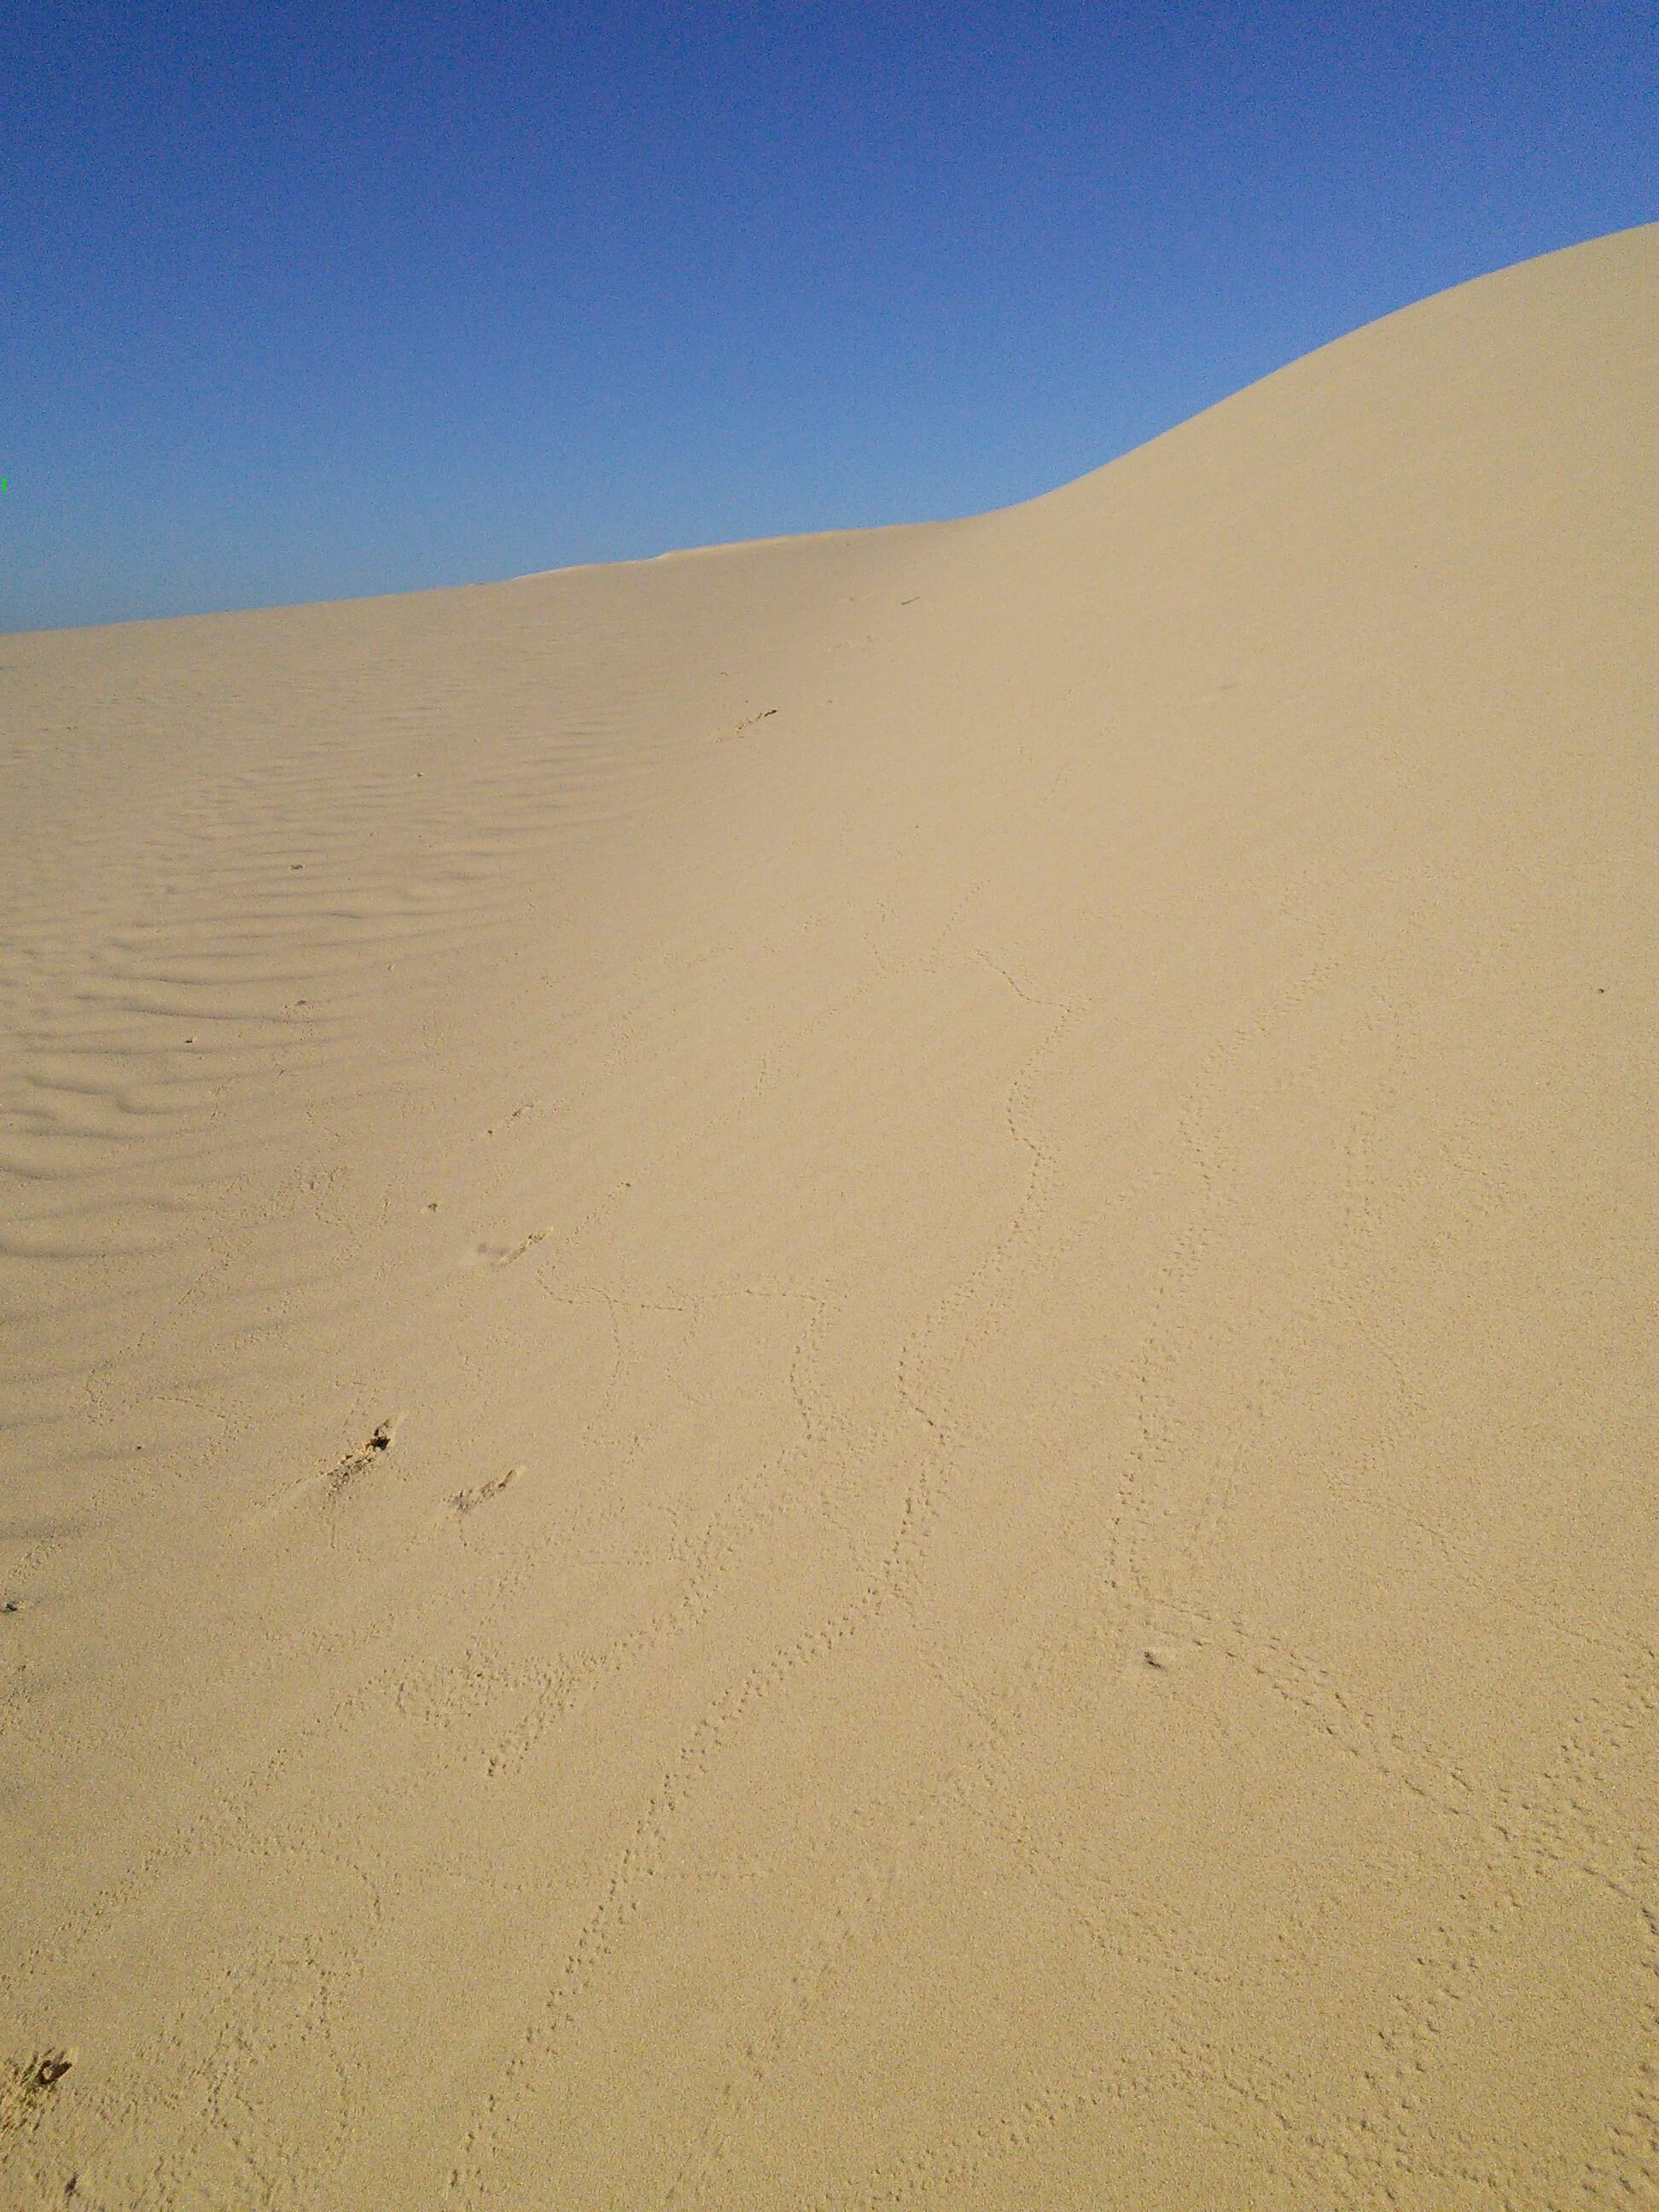 Bug tracks at Monahans SandHills State Park, TX